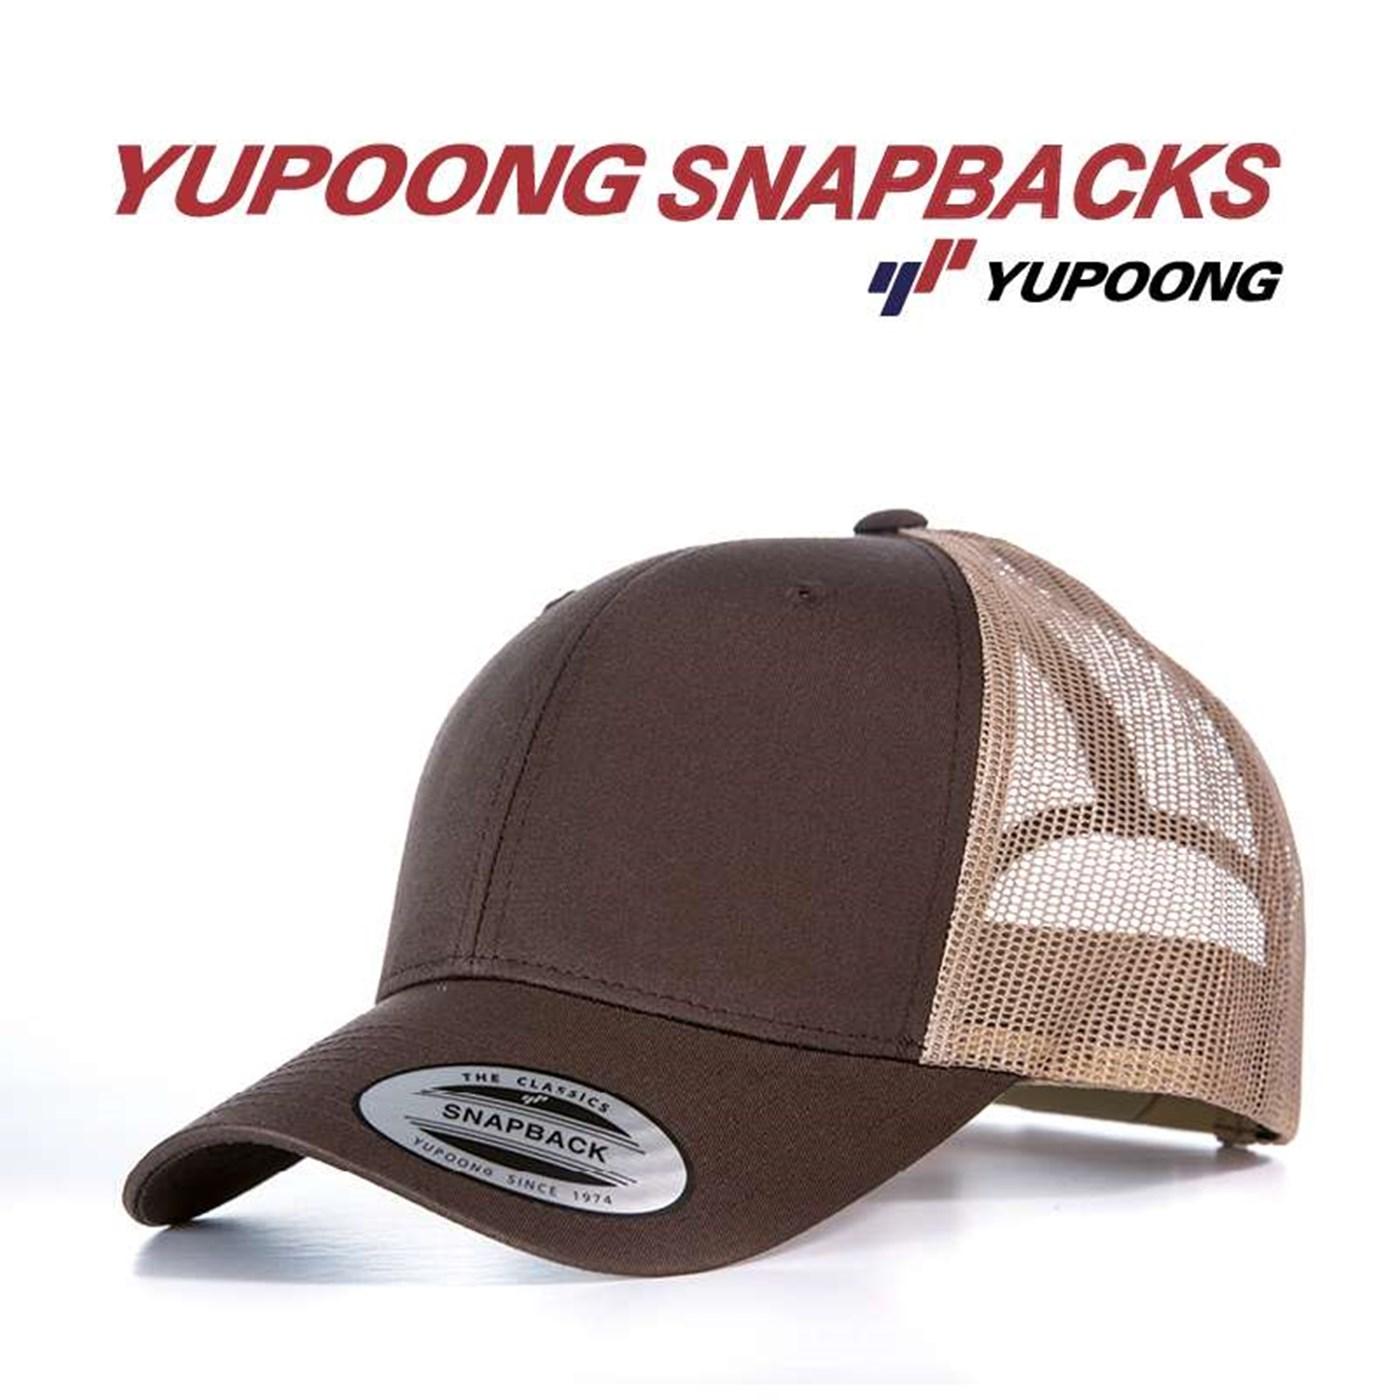 3a6fc0f1fca Flexfit by Yupoong Adult s Retro Snapback Trucker Cap (6606)